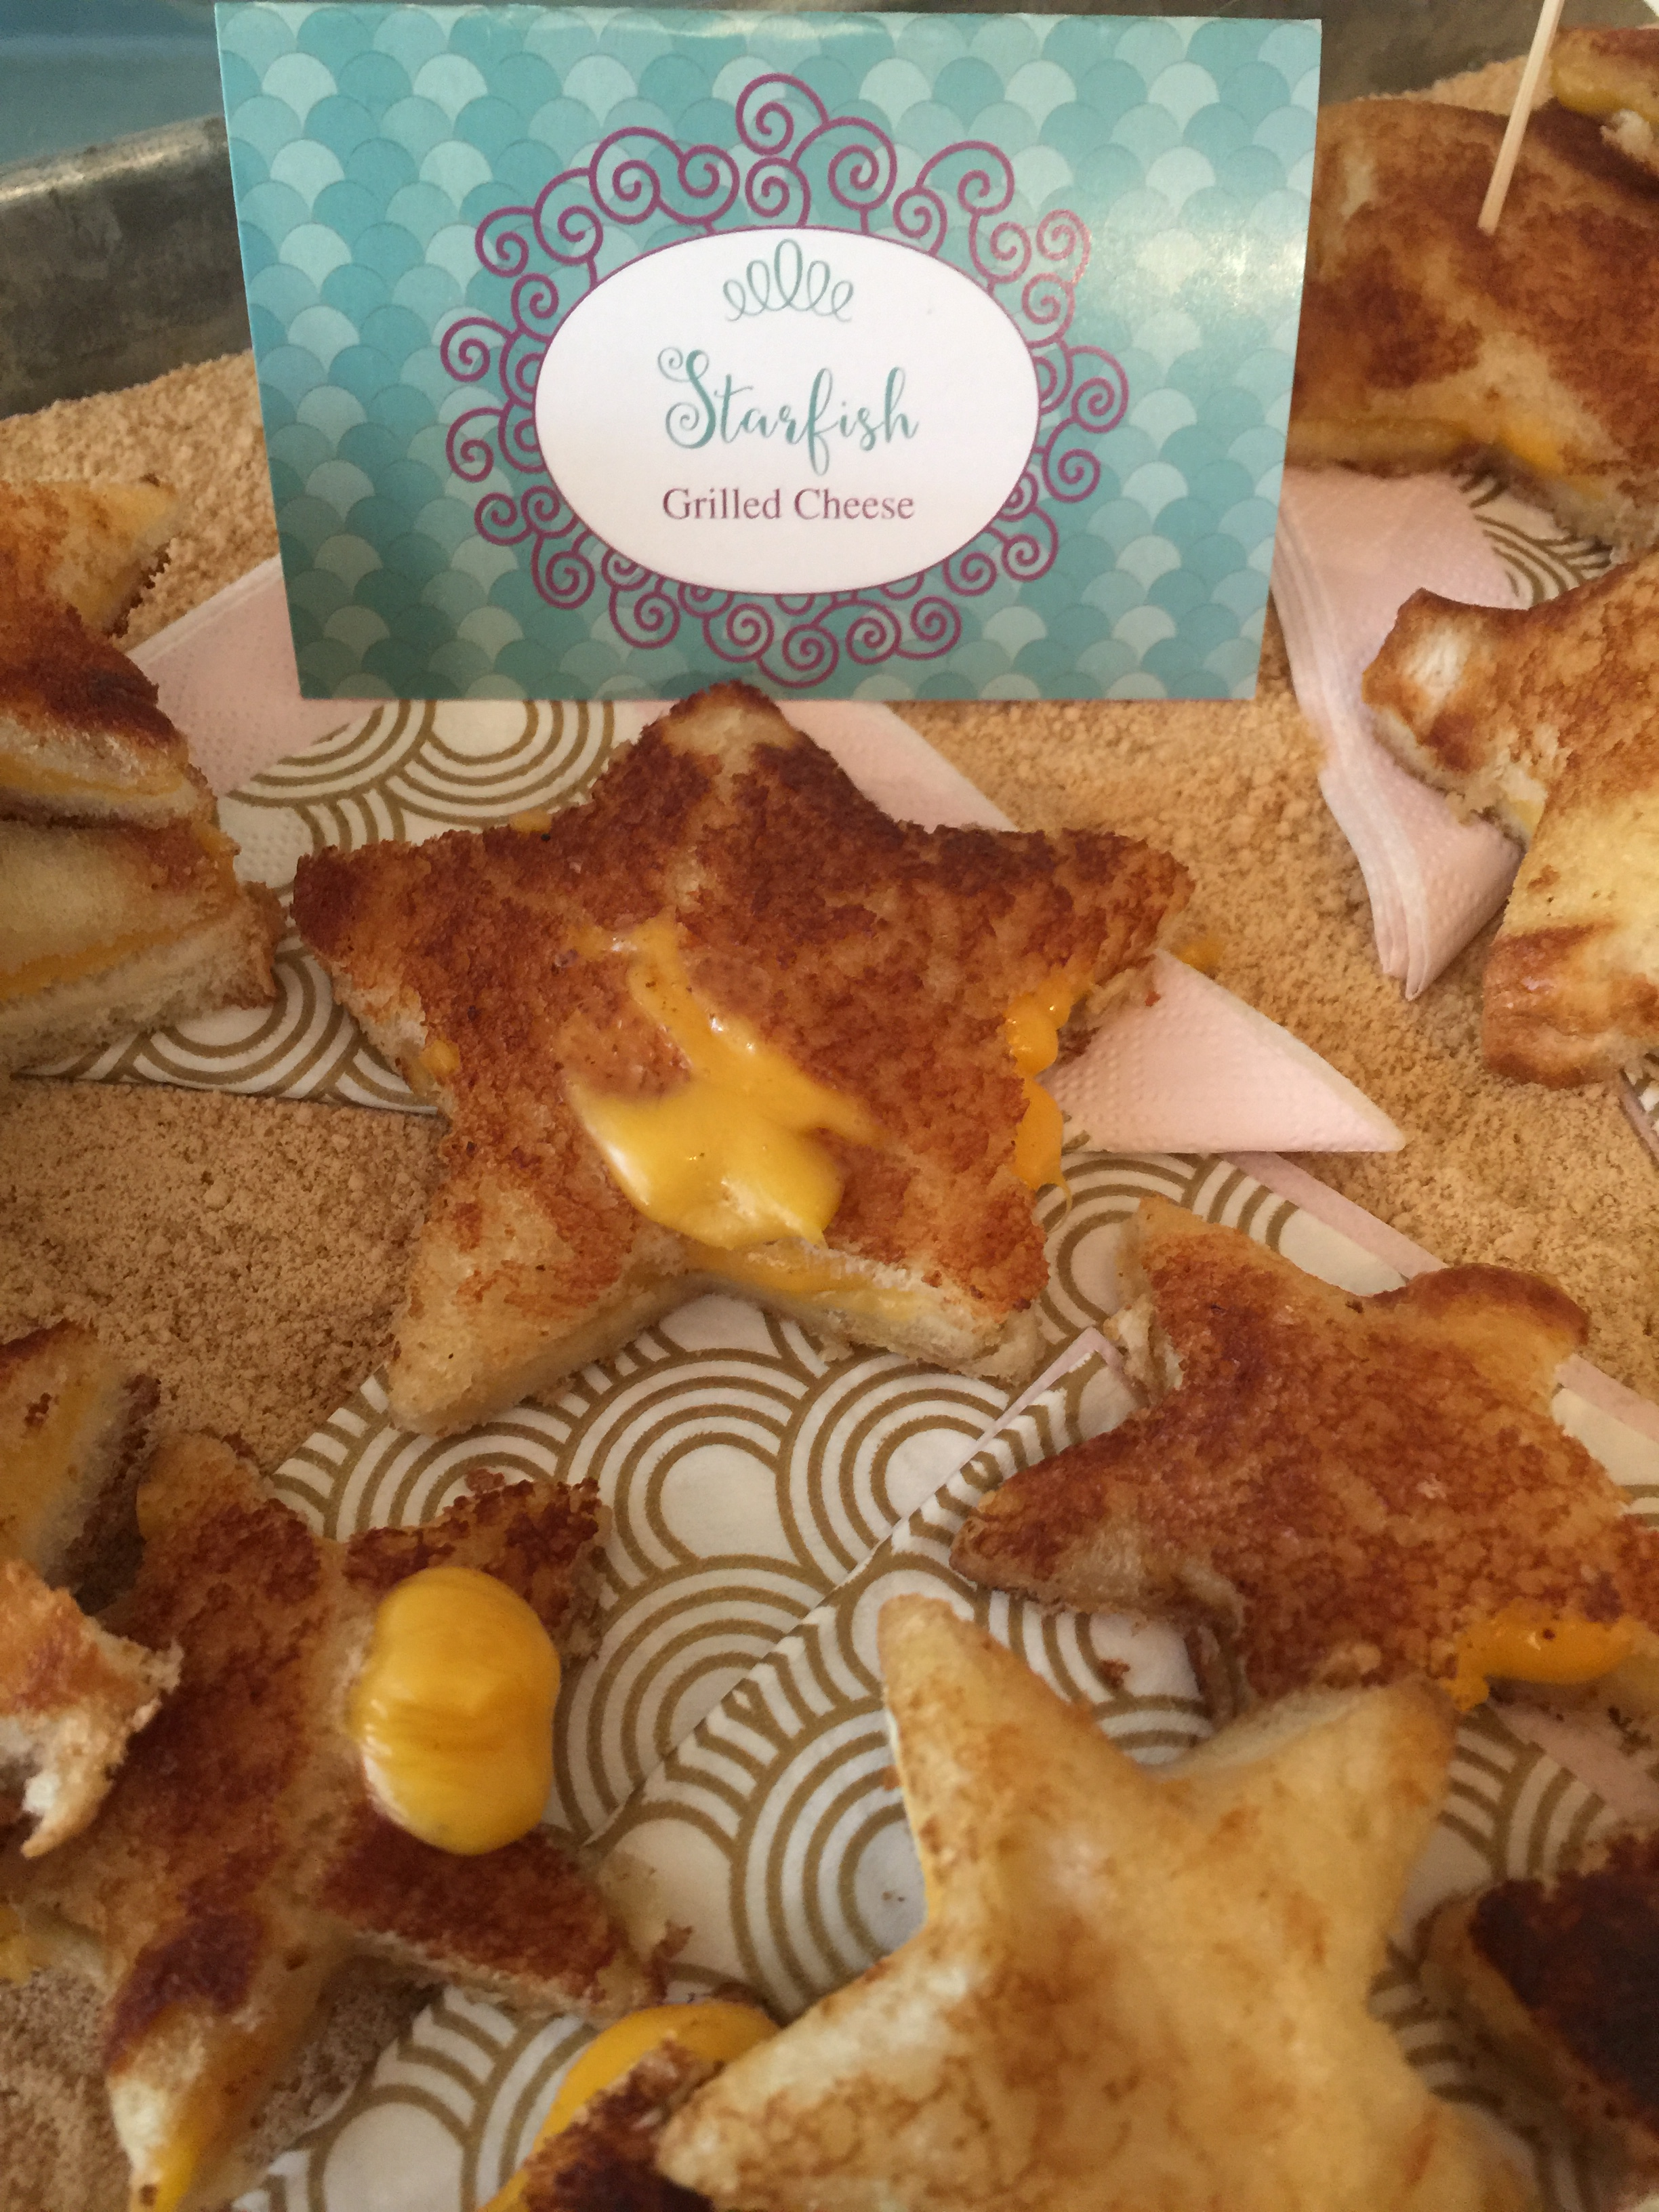 Starfish Grilled Cheese